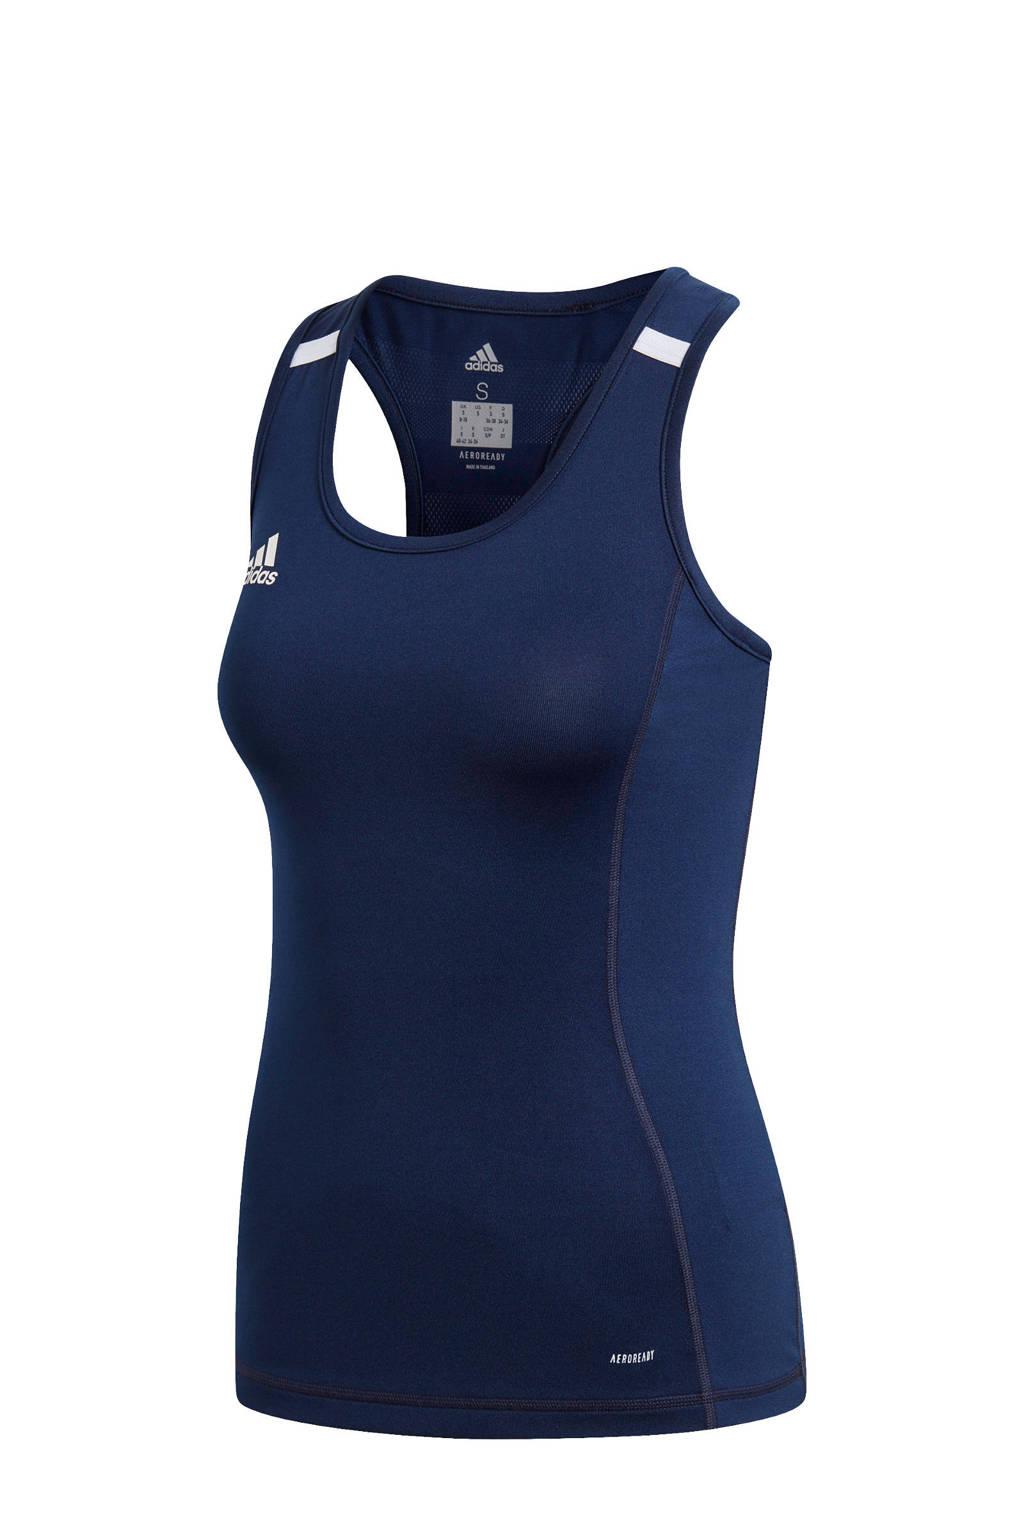 adidas Performance sporttop T19 donkerblauw, Donkerblauw